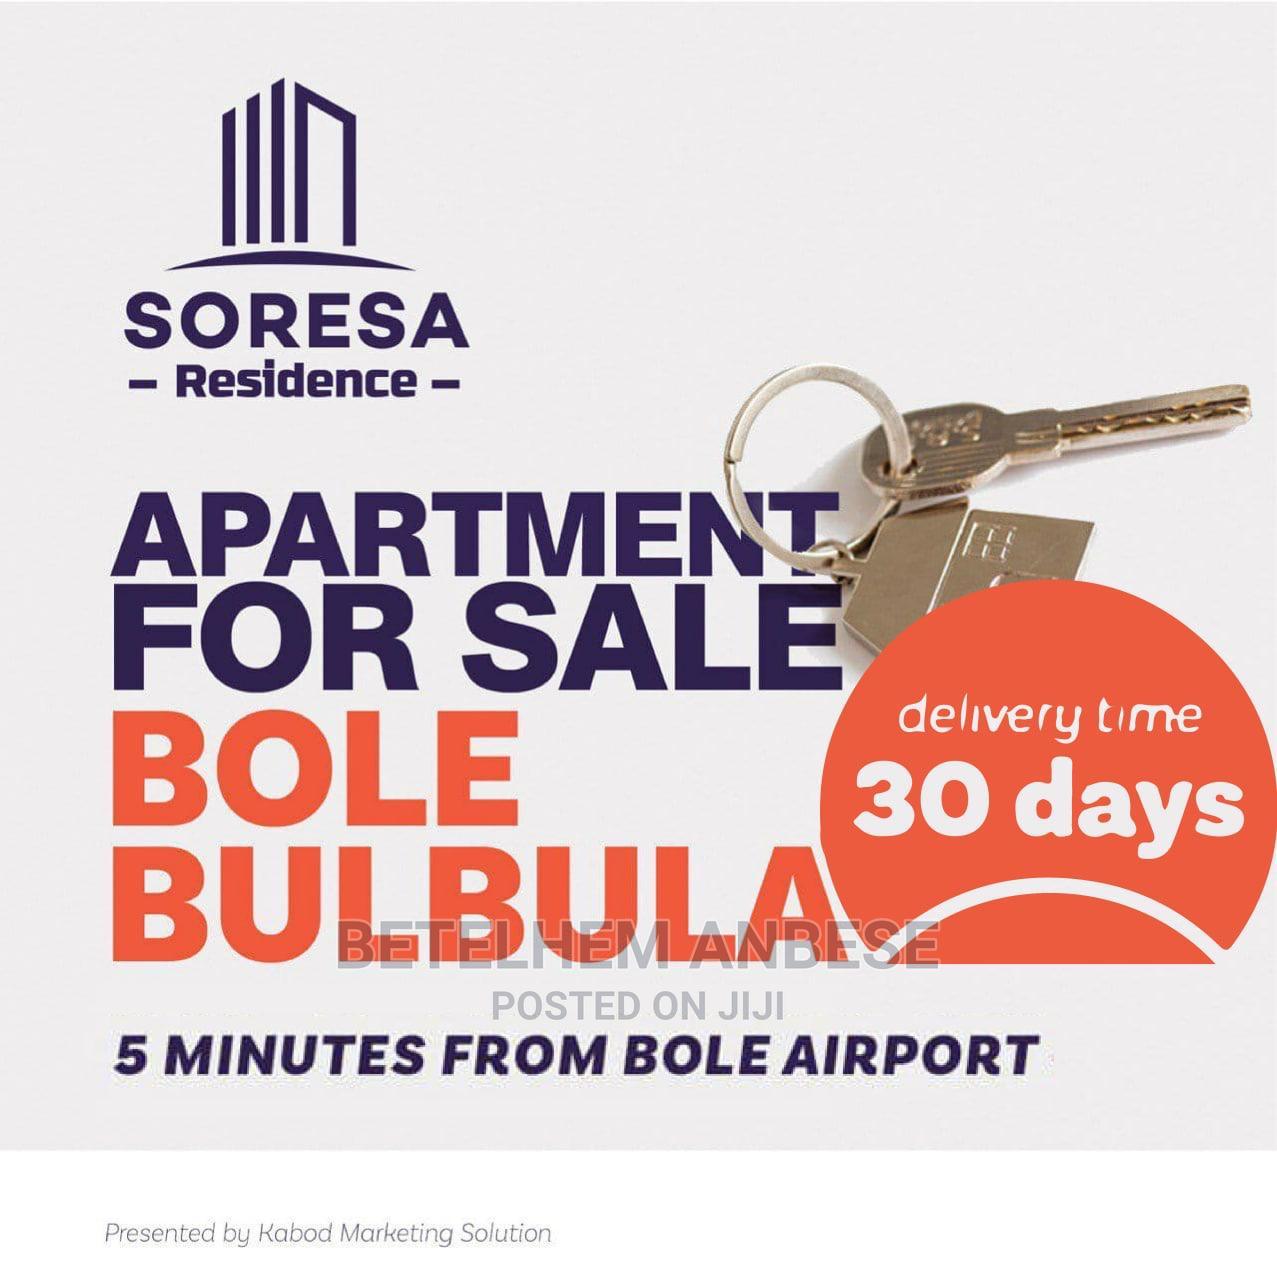 3bdrm Apartment in Soresa Residence, Bole for Sale